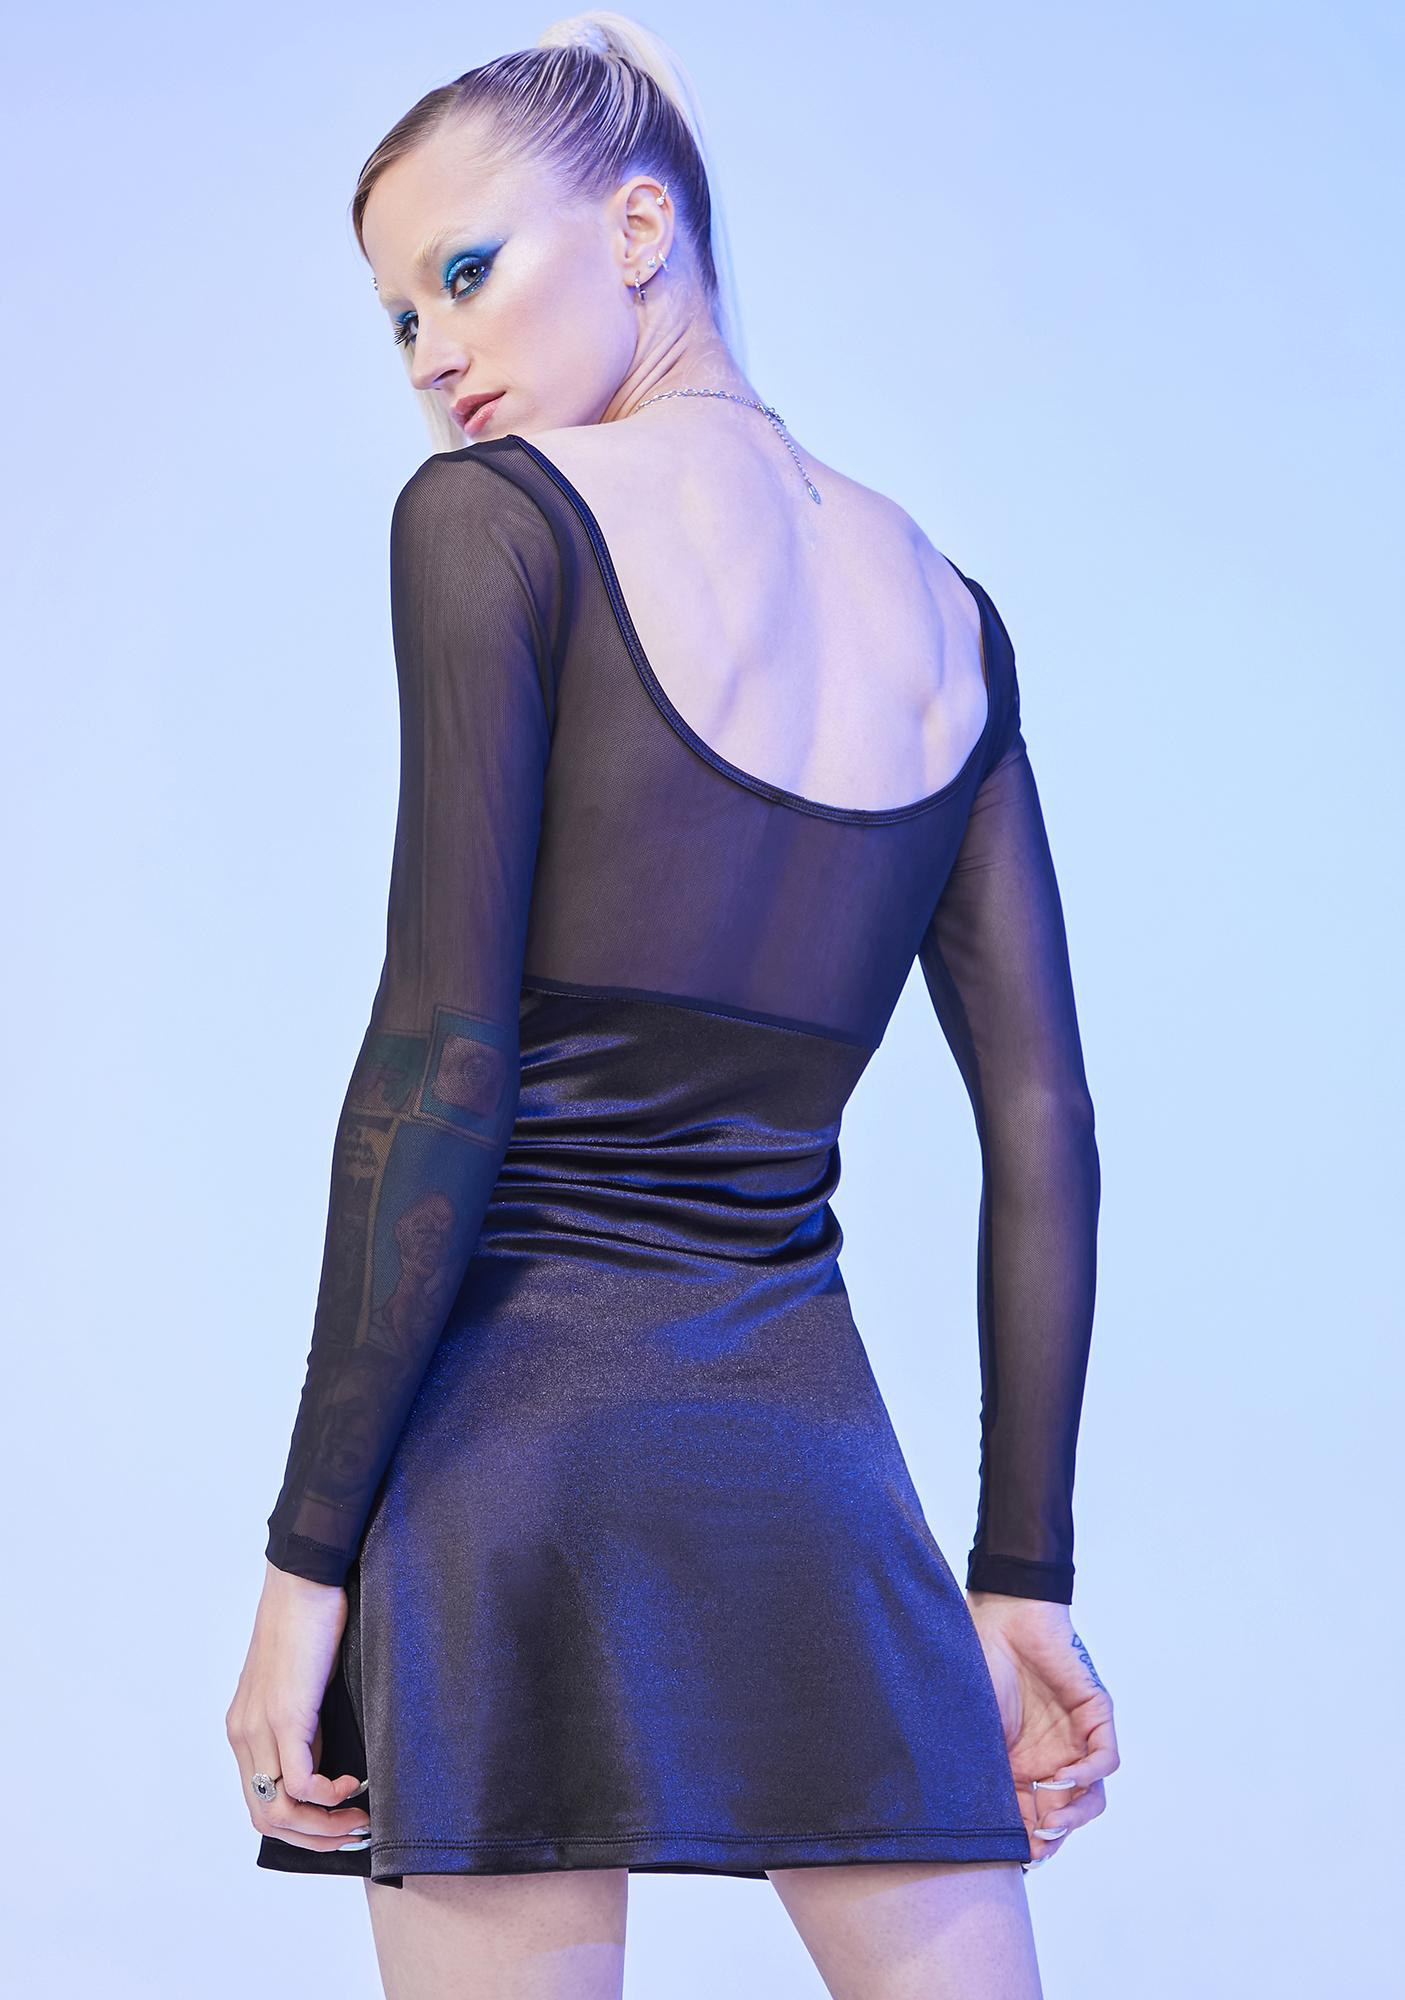 HOROSCOPEZ Tossing And Turning Satin Mini Dress